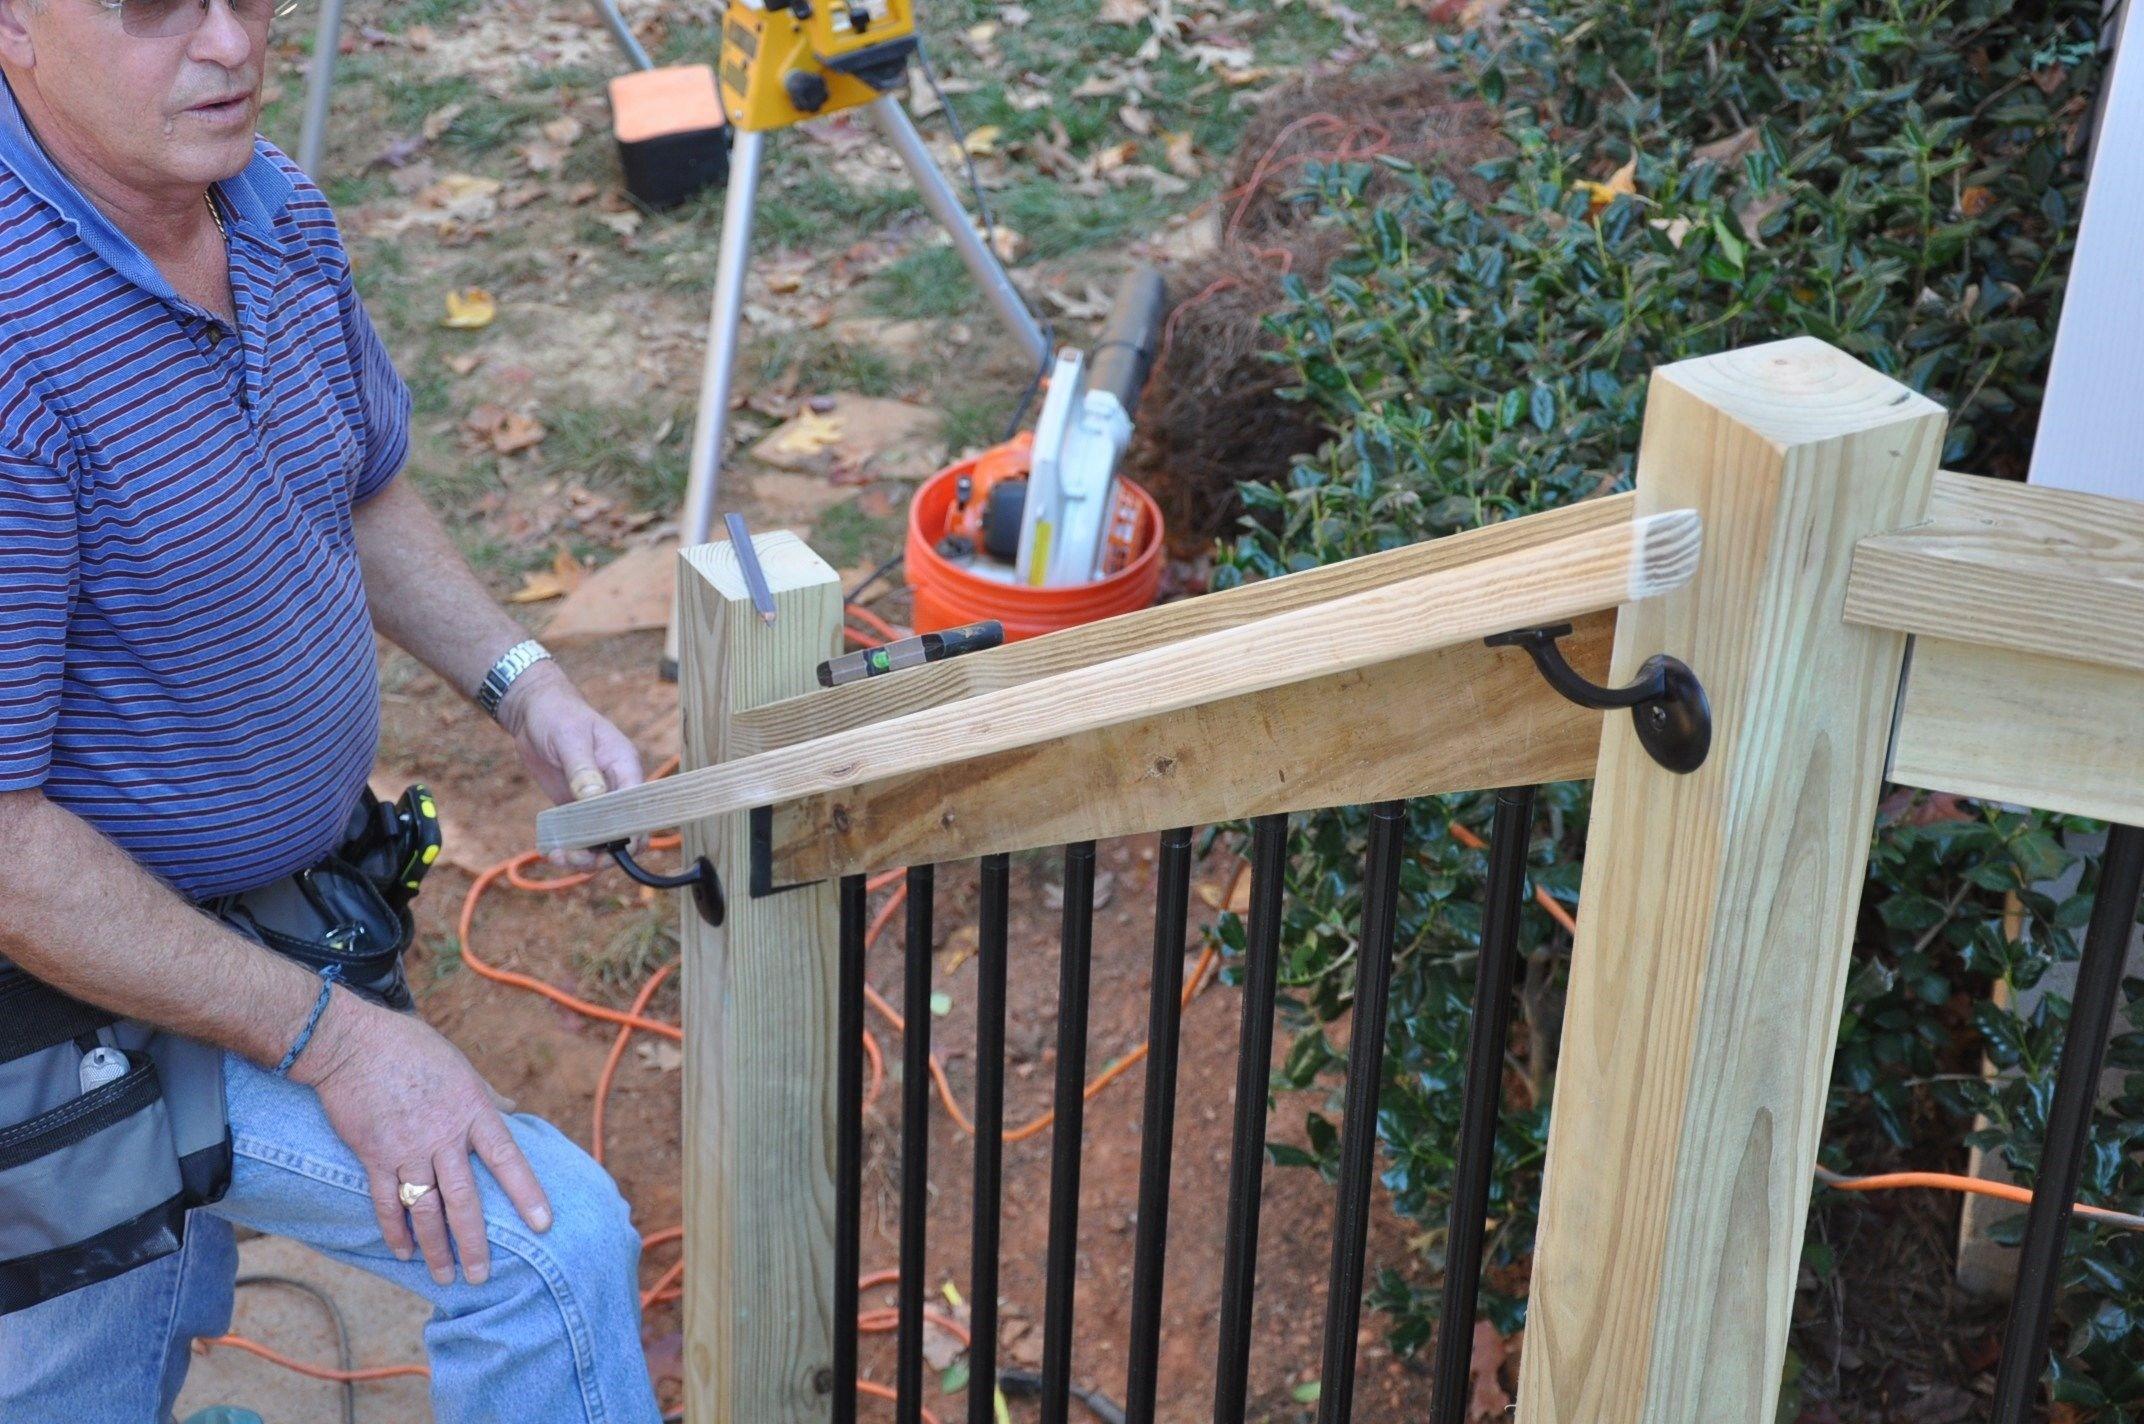 How To Install Deck Stair Railings Decks Com | Outdoor Stair Railings Near Me | Porch Railings | Front Porch | Composite | Metal Stair | Stair Treads